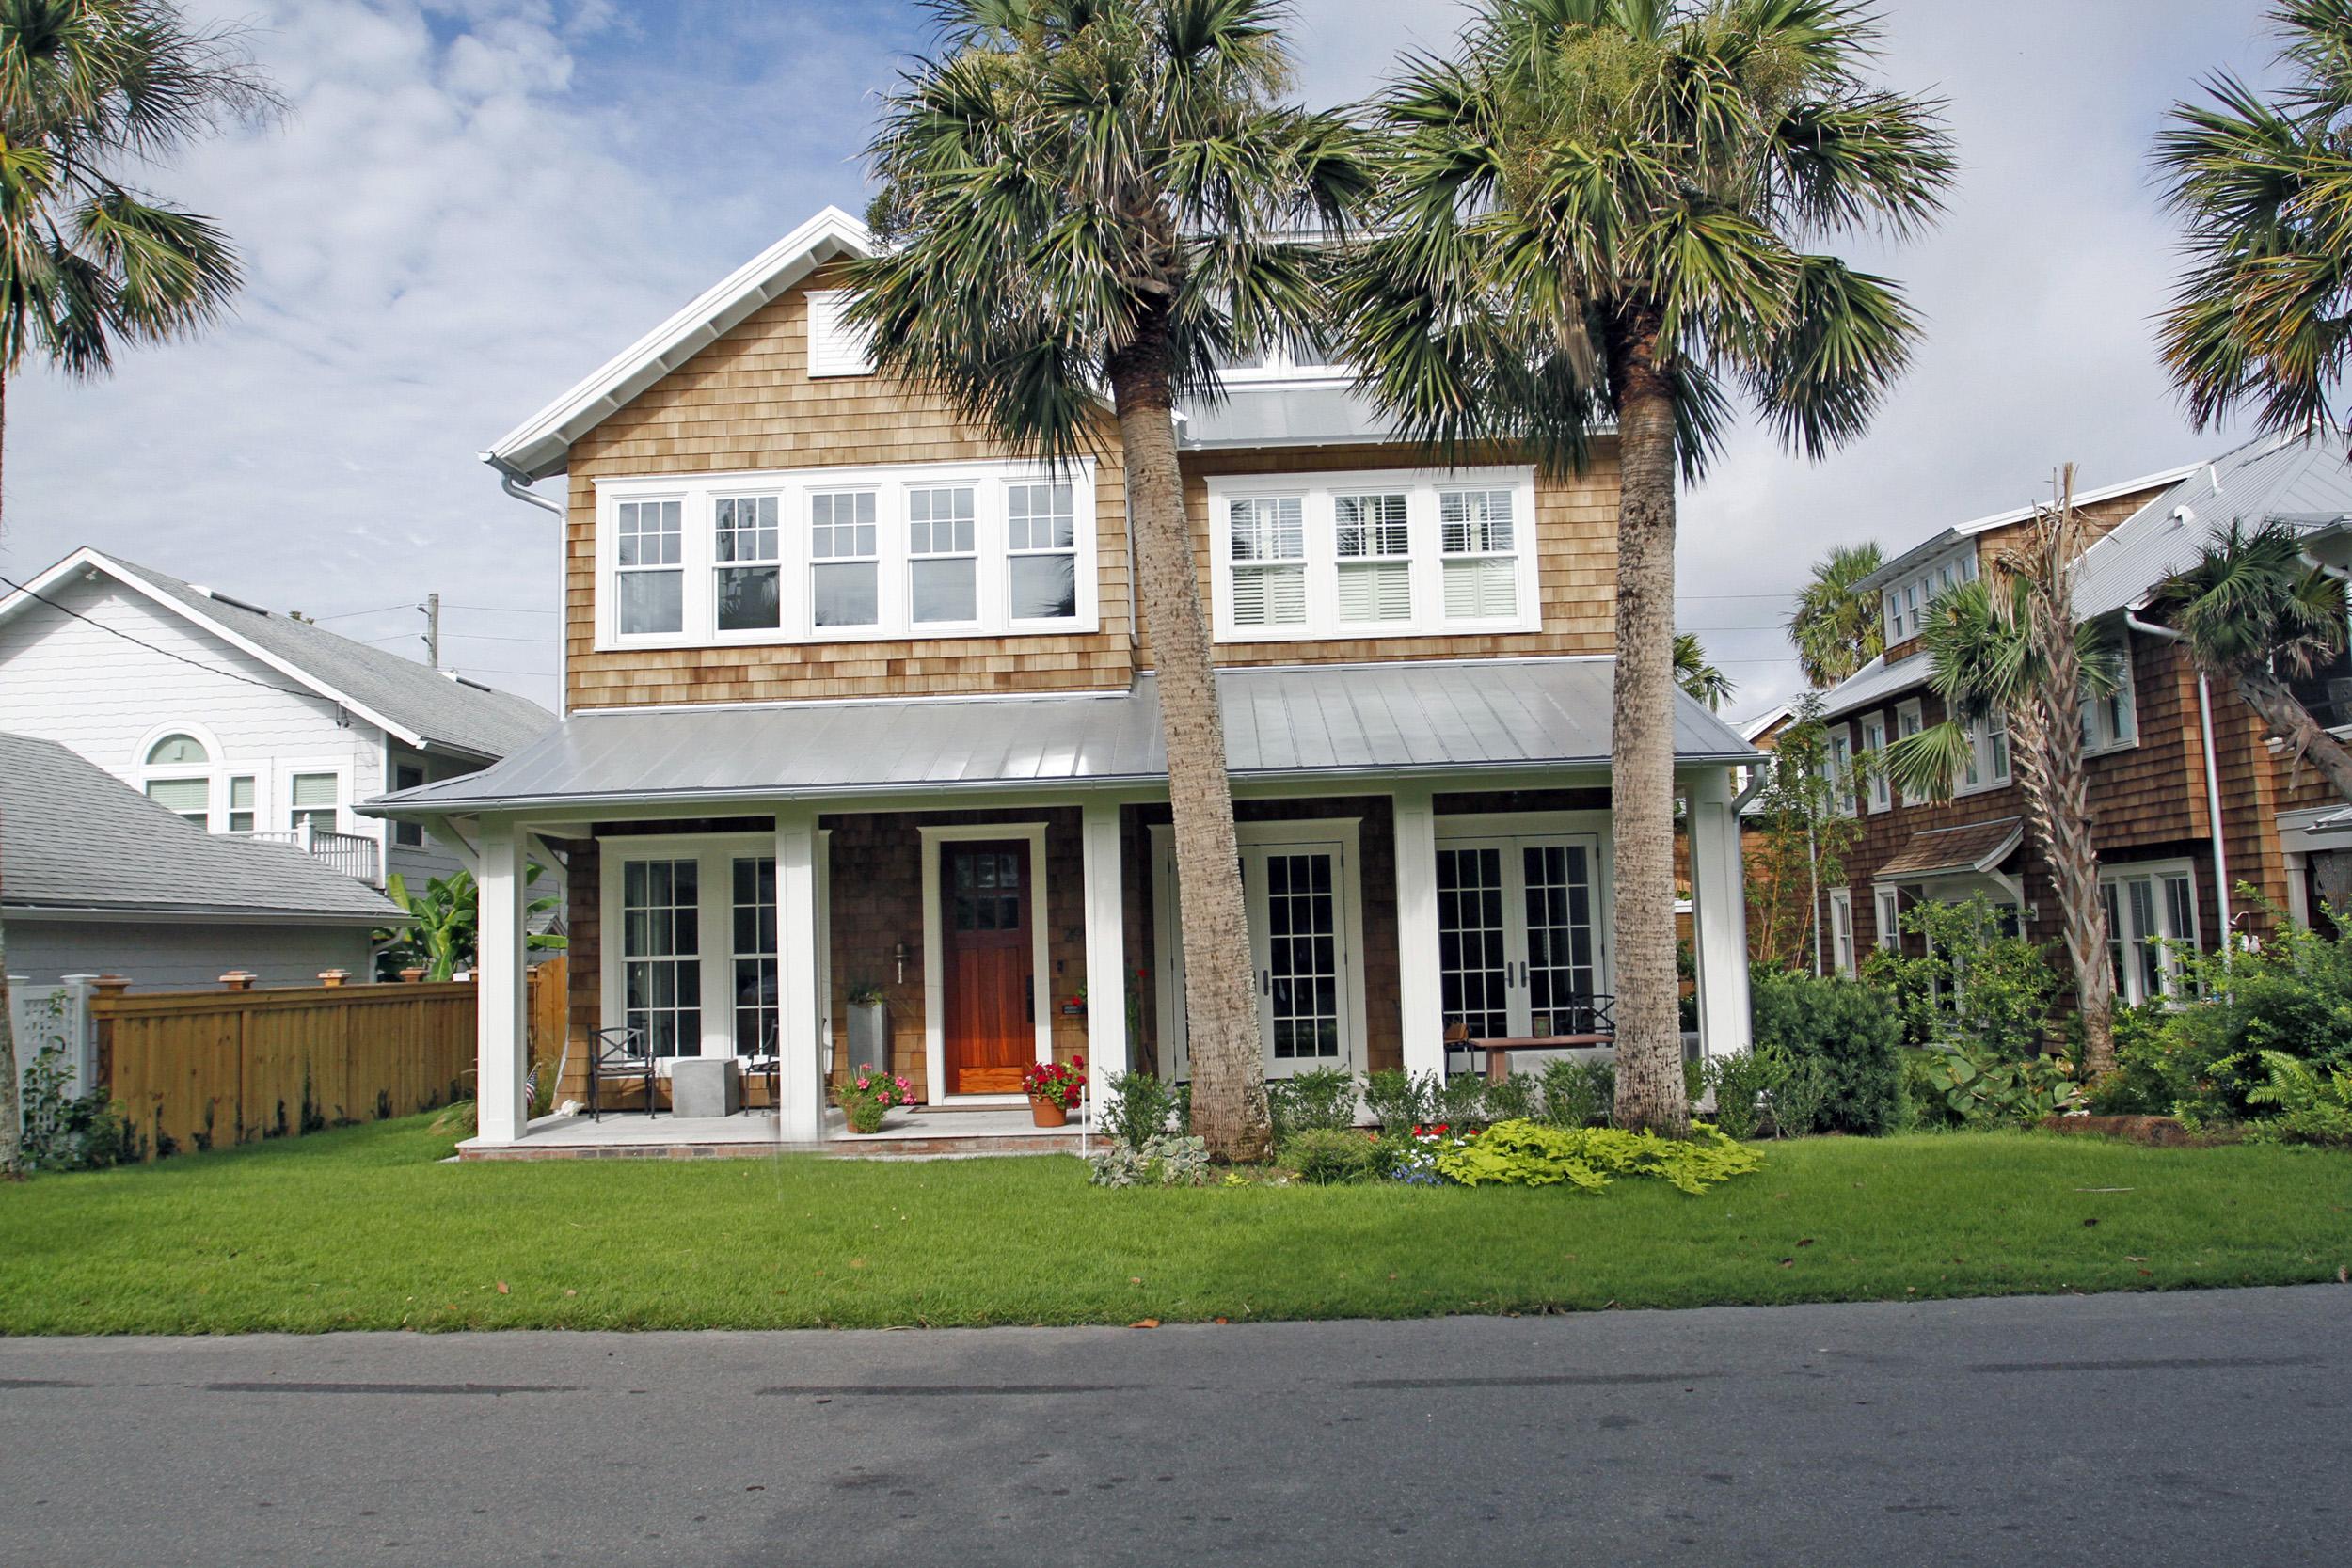 custom home builder neptune beach, bosco building, general contractor neptune beach, home maintenance neptune beach